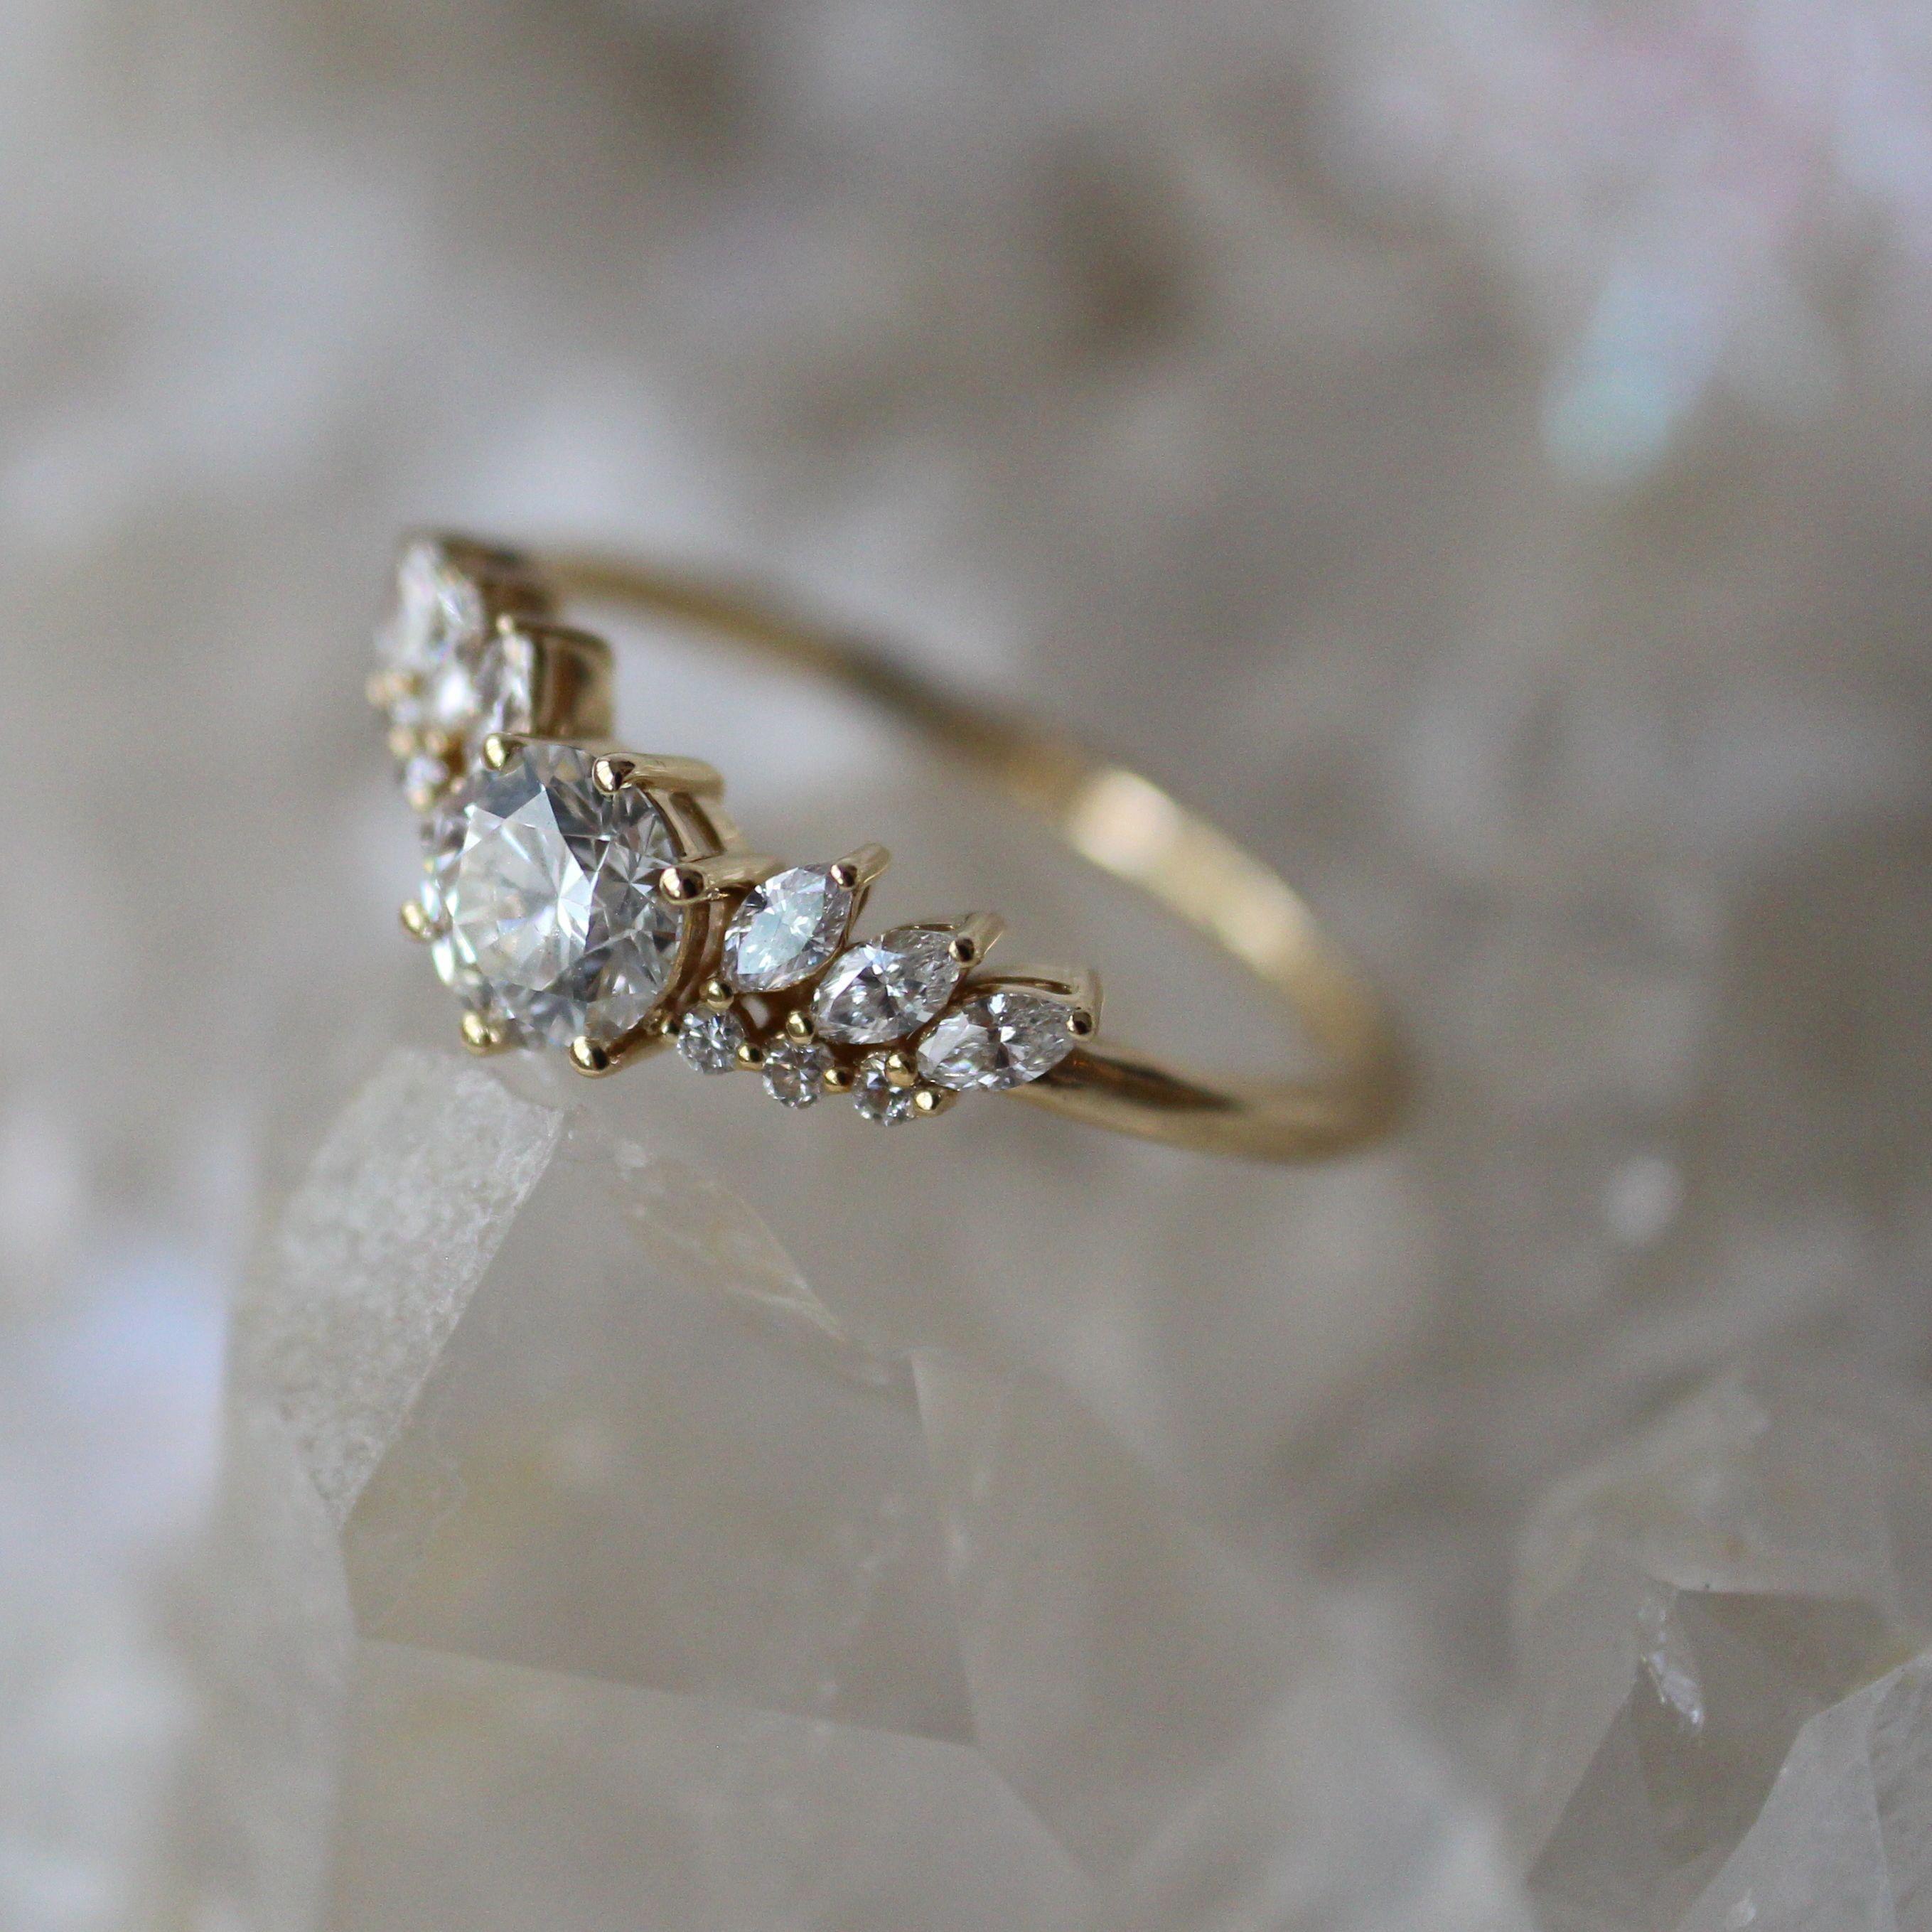 Weddingrings Vintage Gold Engagement Rings Unique Engagement Rings Pink Wedding Rings